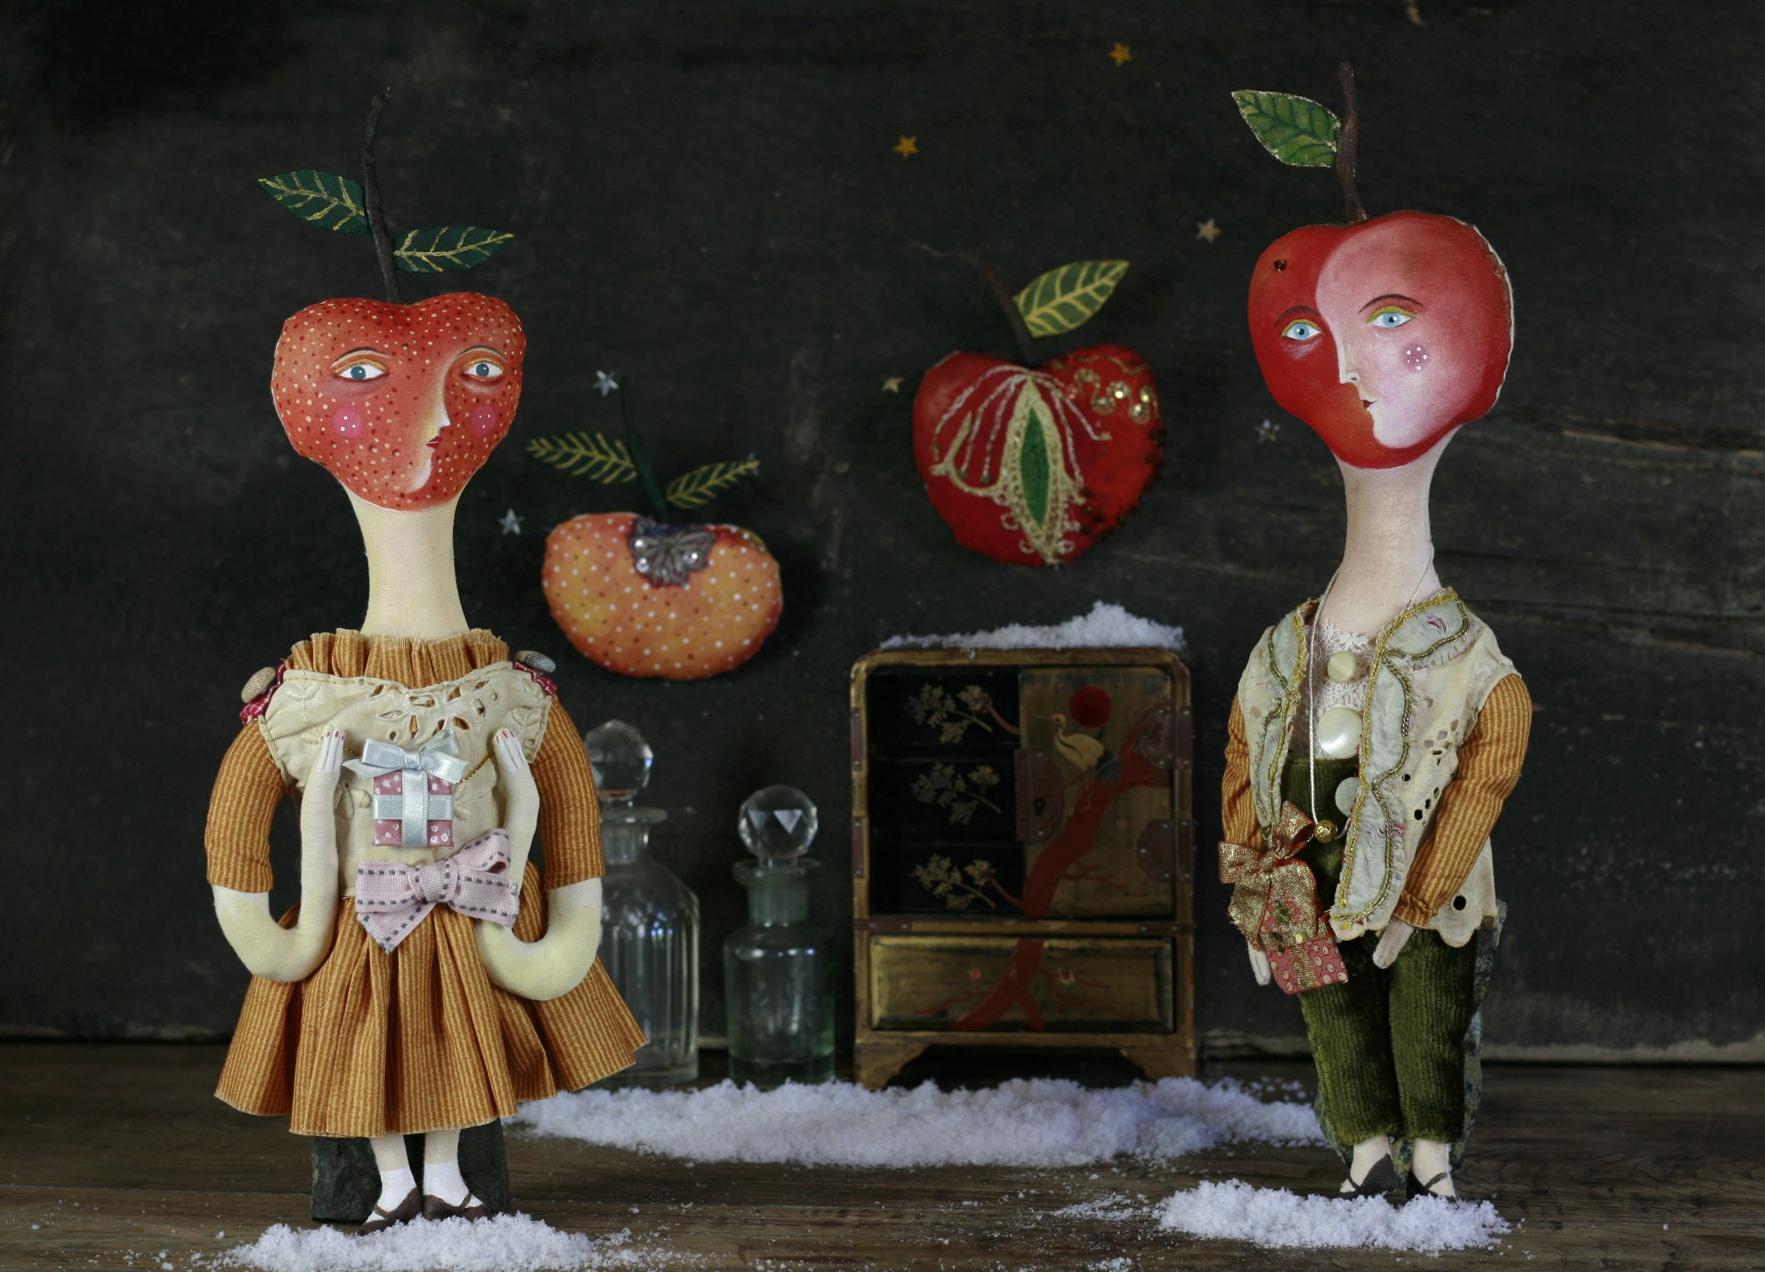 fairytale art